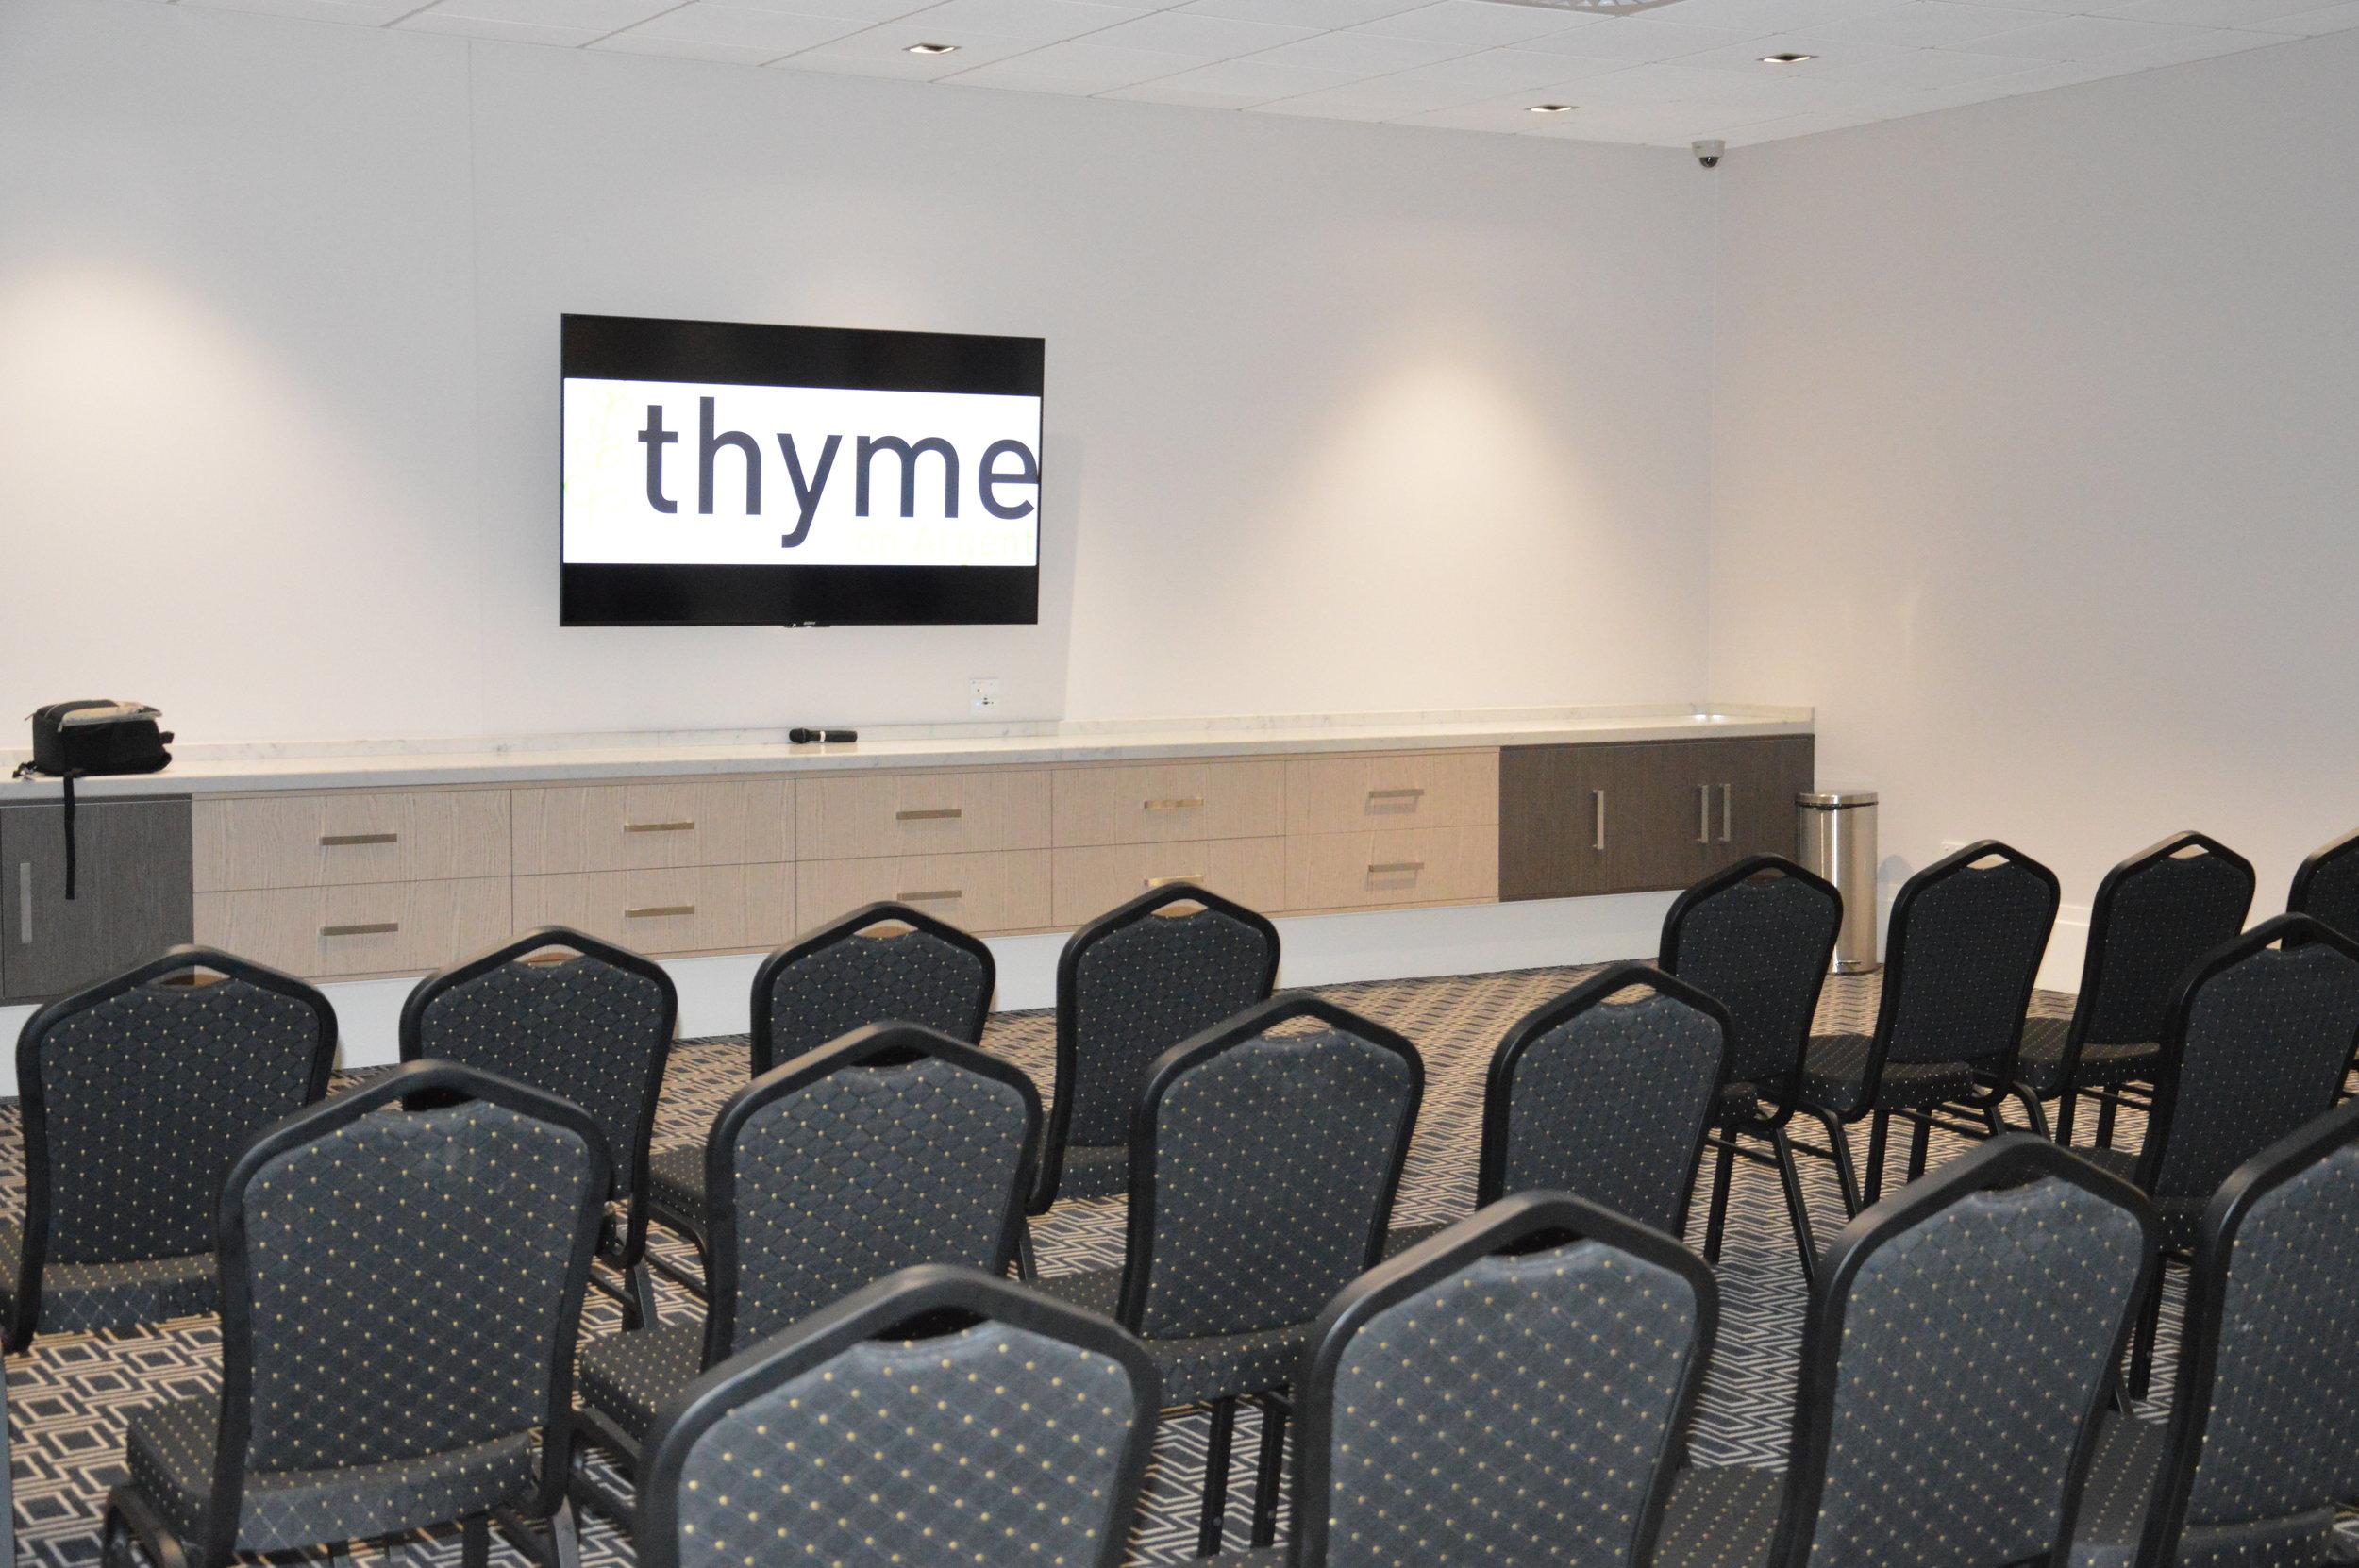 presentation room setup 2.JPG